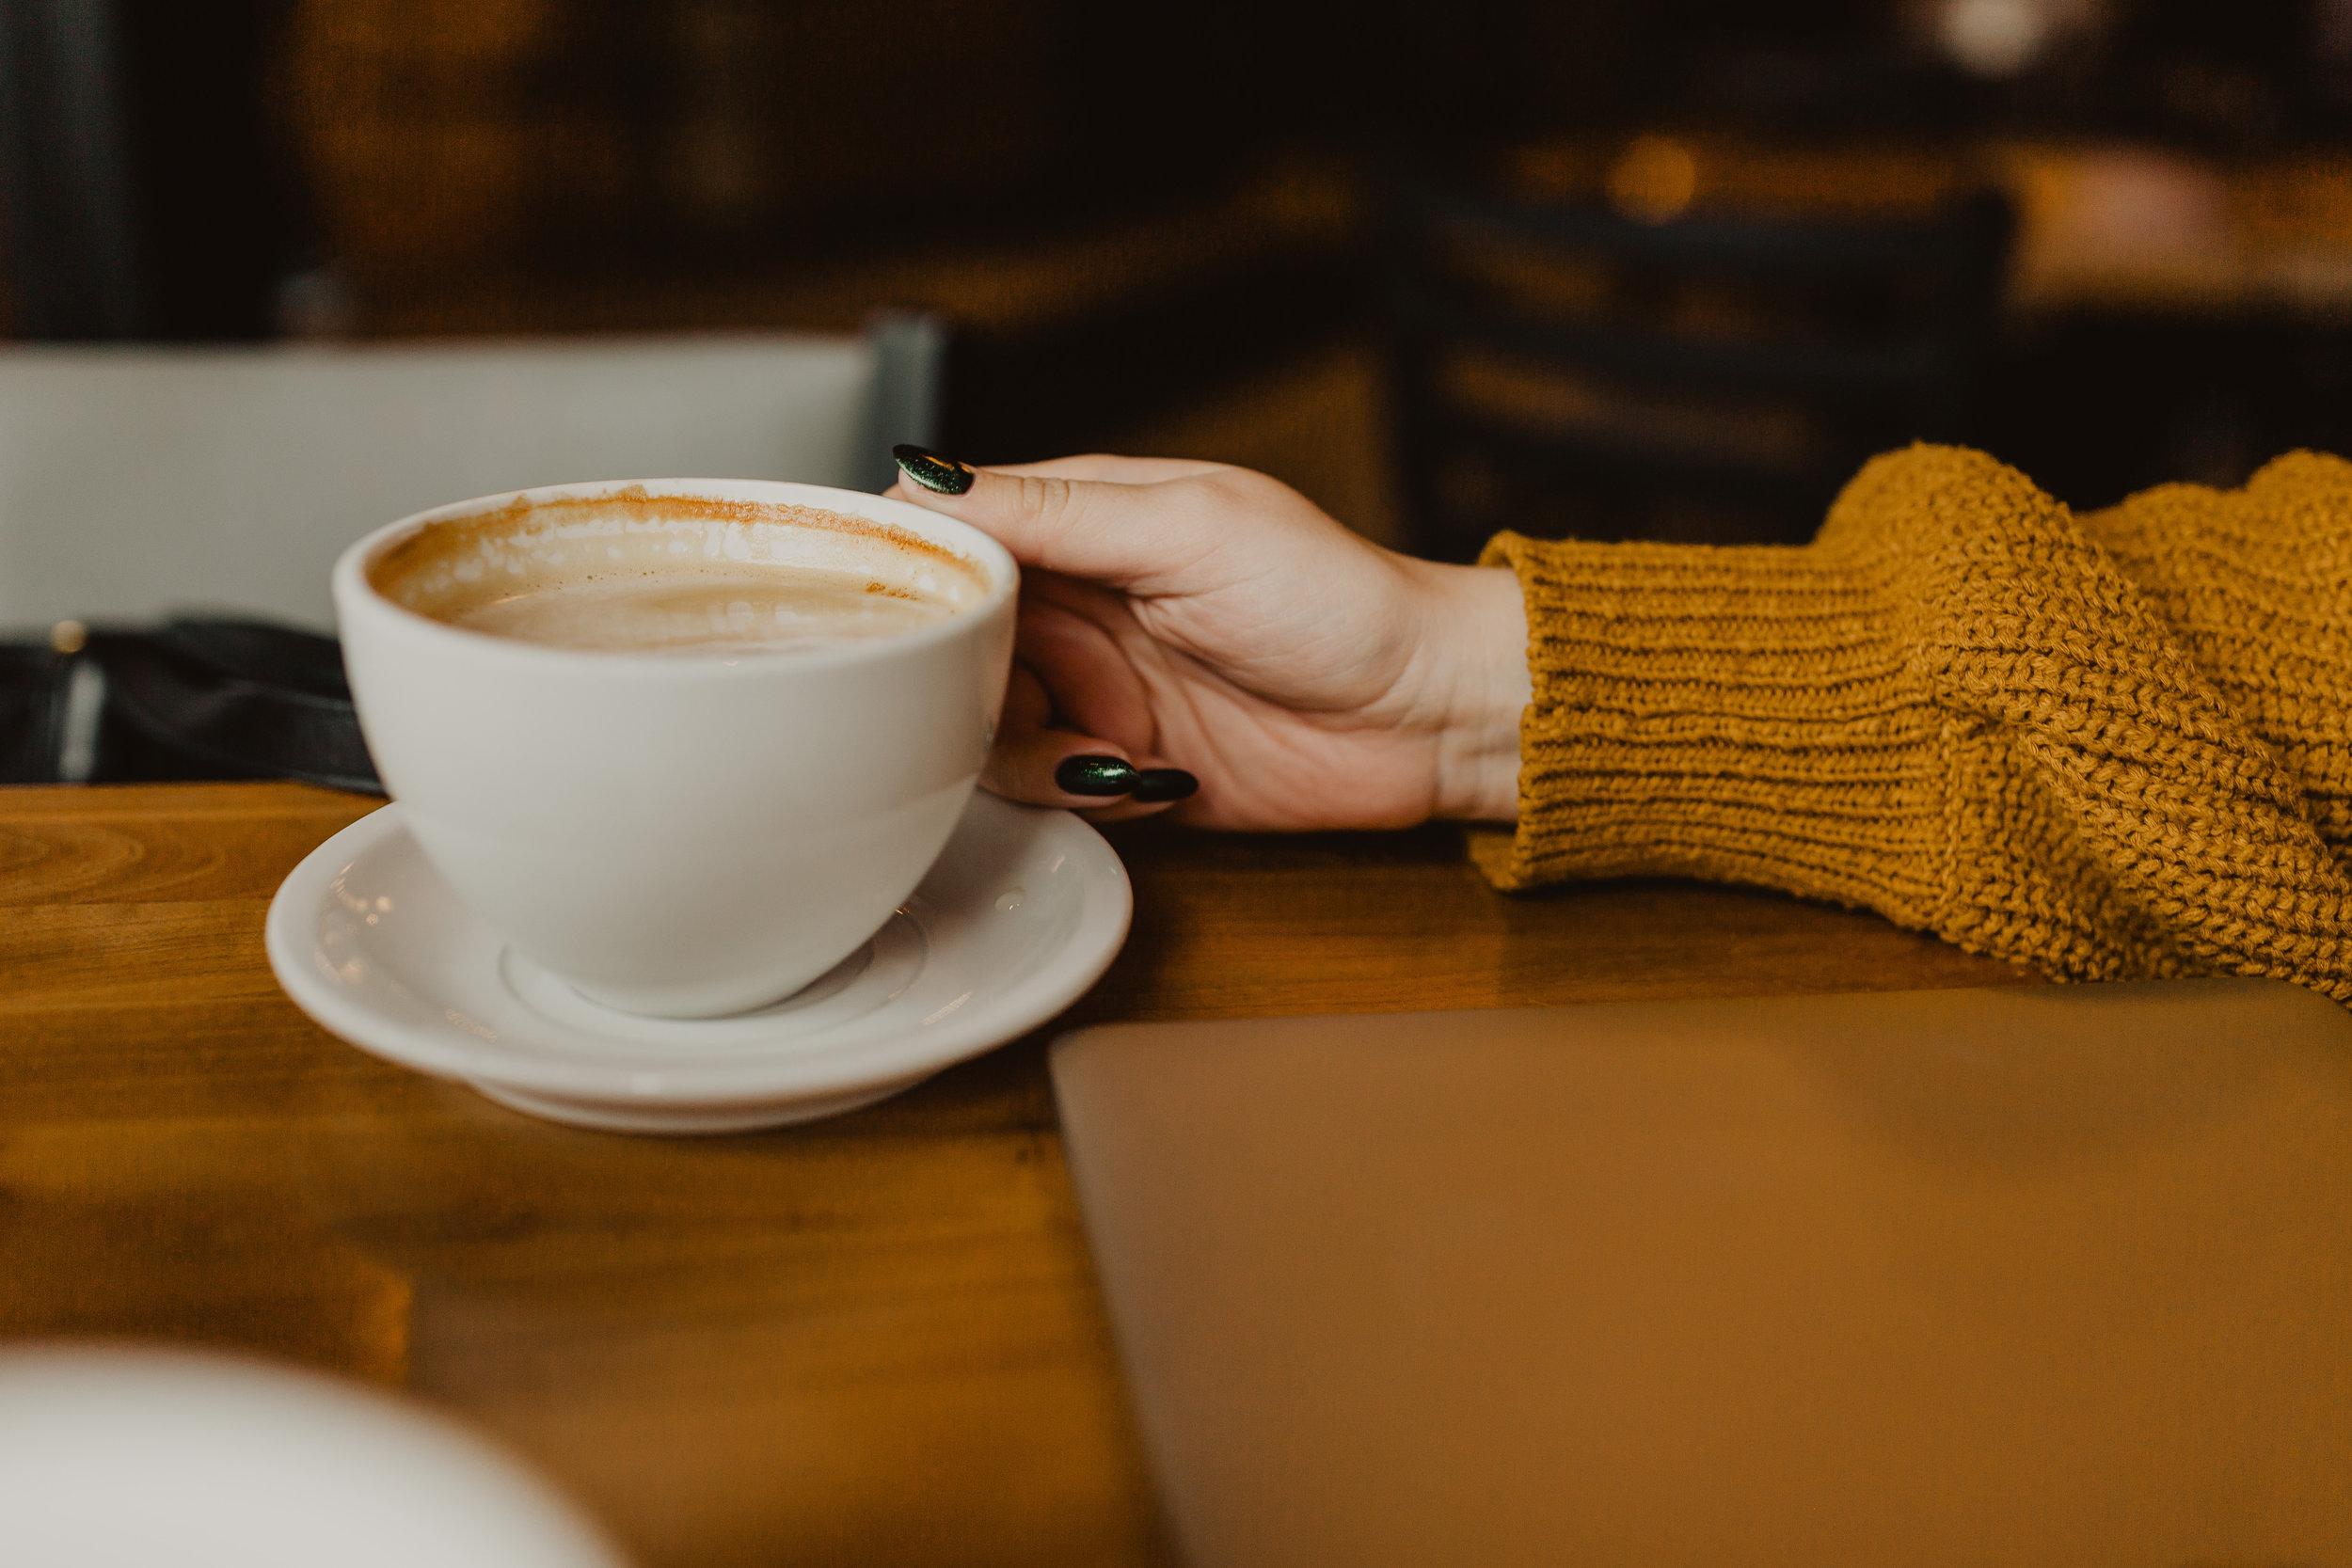 lifestyle_coffeeshop-3.jpg